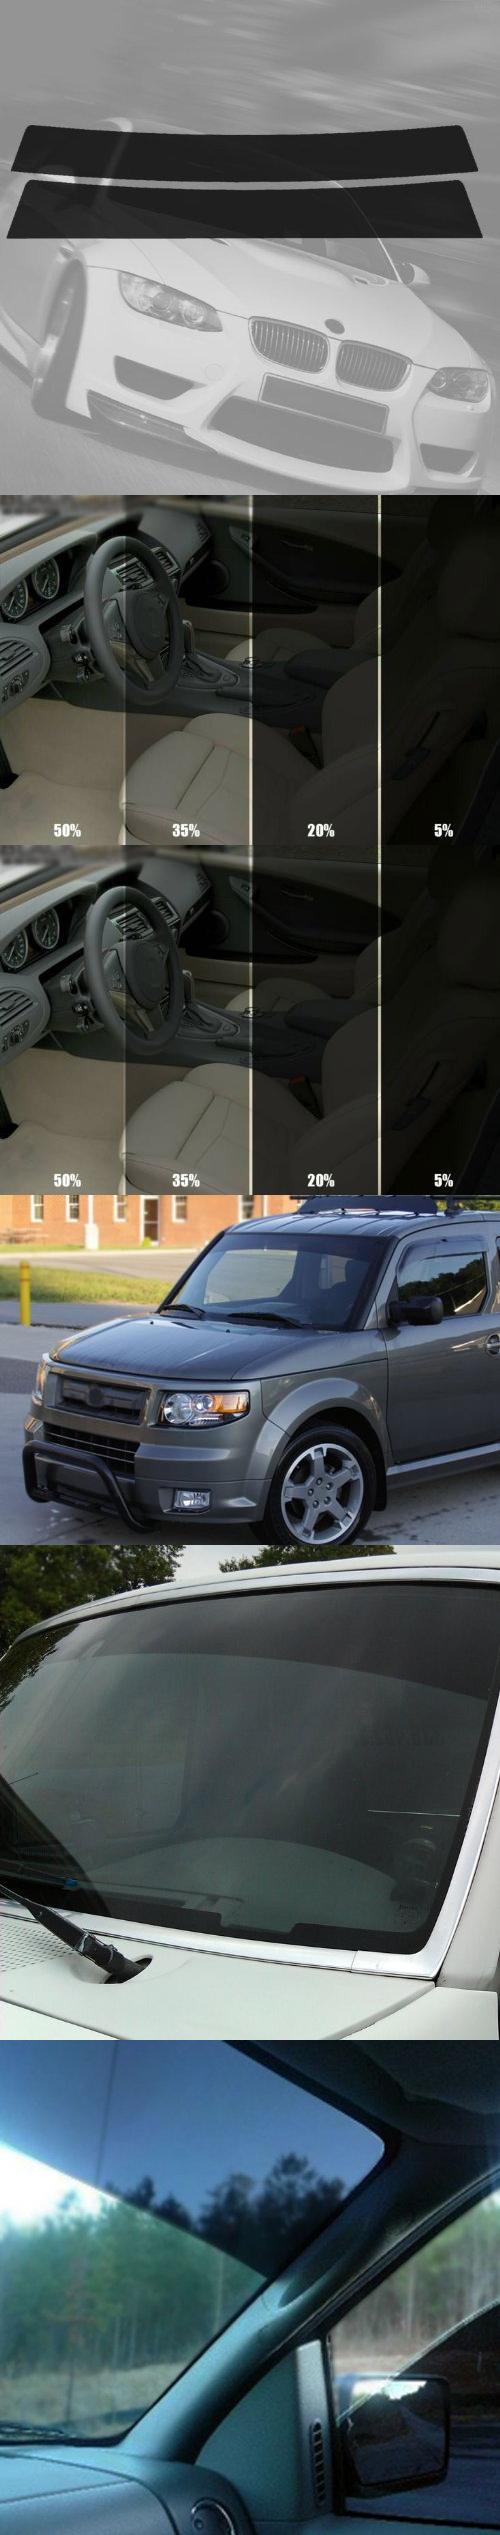 Tint Shades Tinted Windows Windshield Tinting Crew Cab